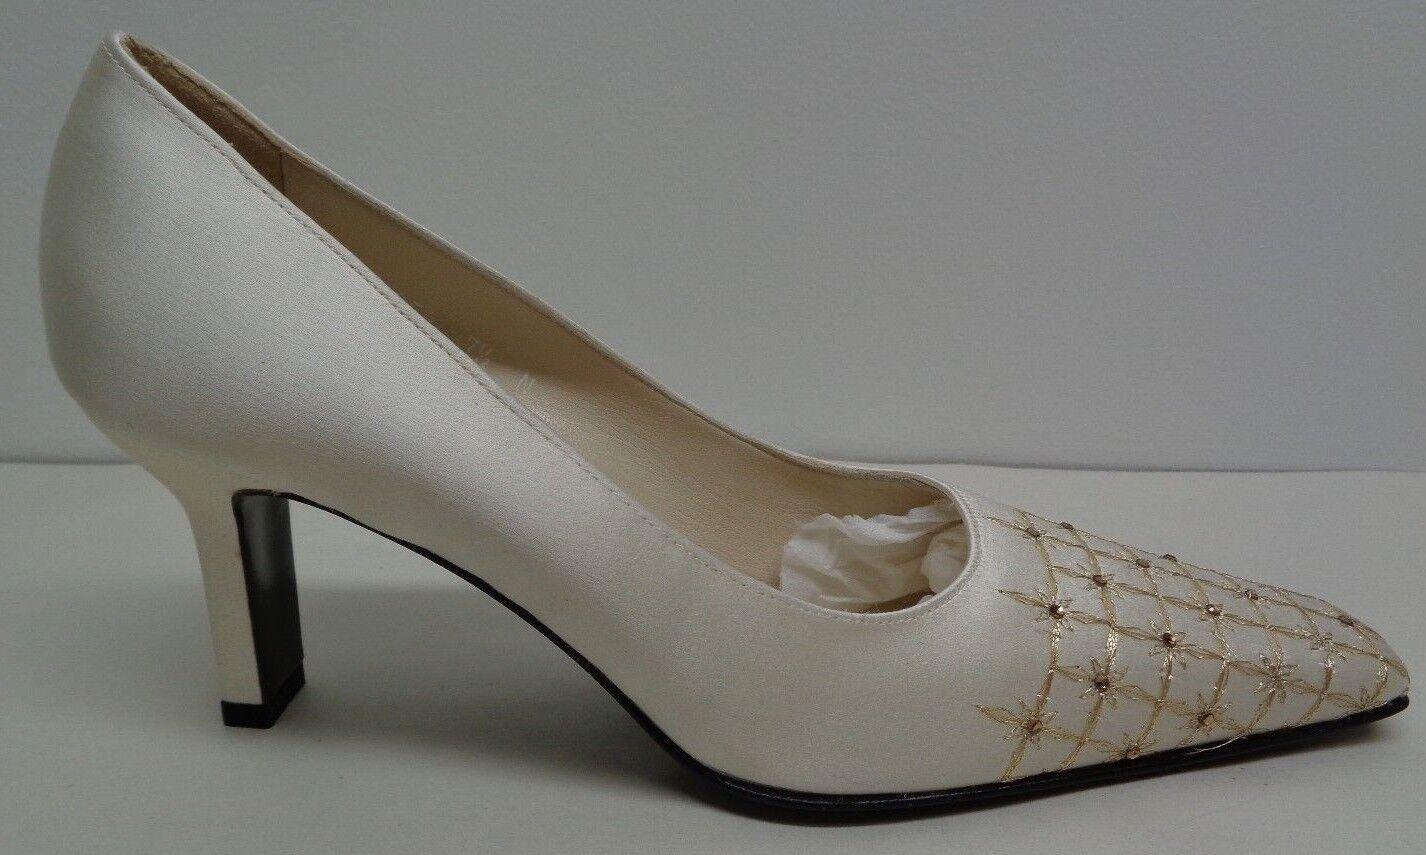 Pancaldi Taille 7.5 AA Narrow P9828F Beige Satin Heels Pumps New femmes chaussures